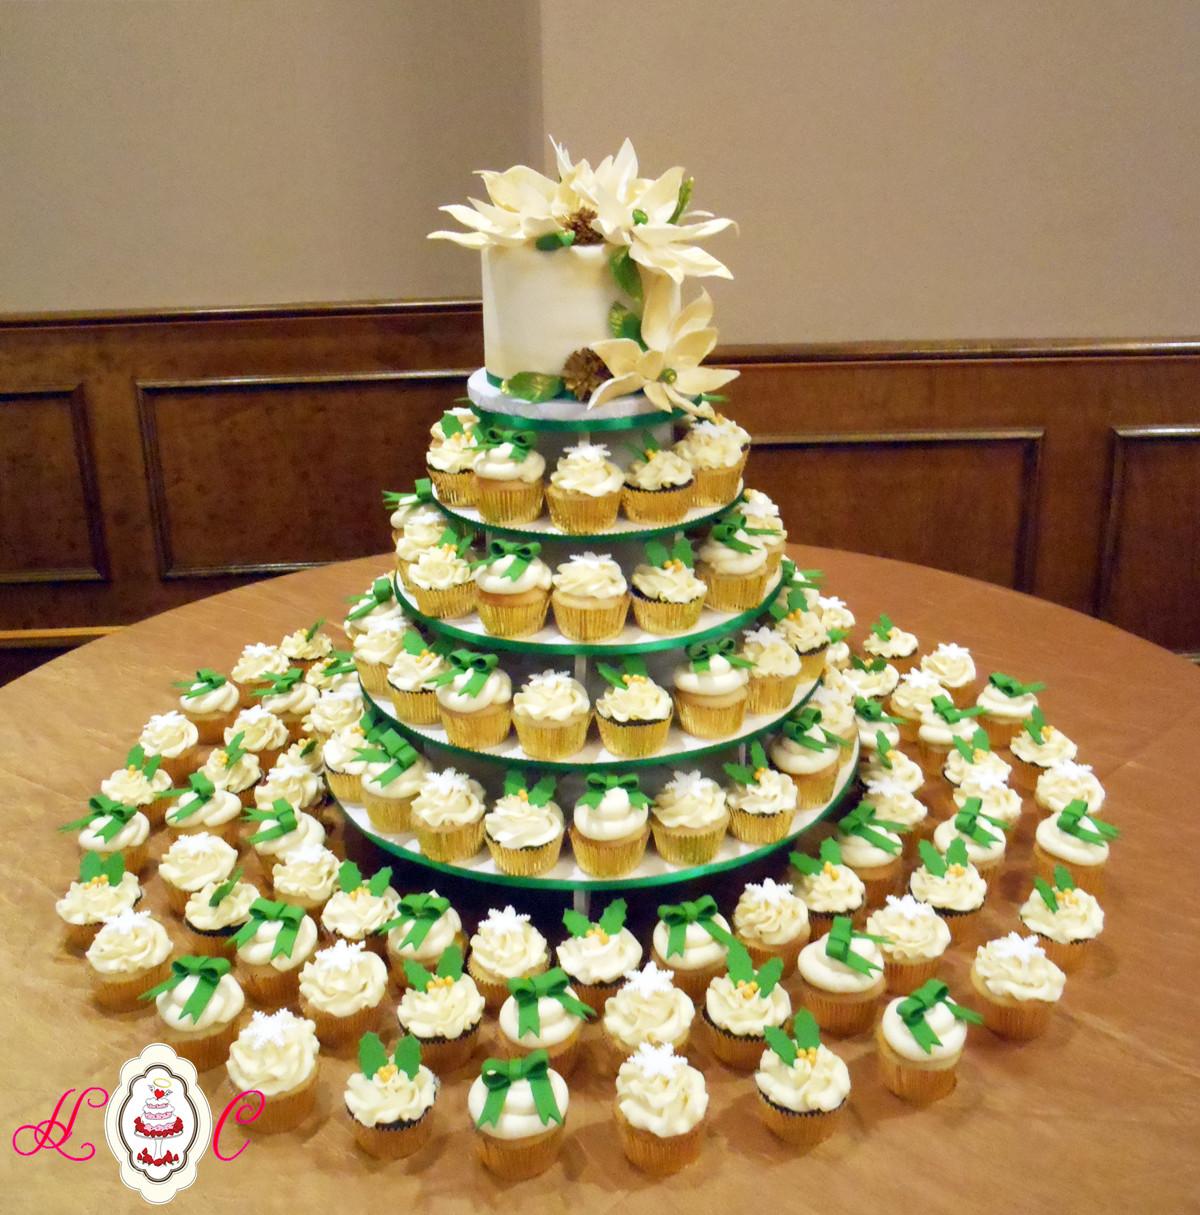 Wedding Cupcakes Pictures  Wedding Cakes in Marietta Parkersburg & More Heavenly